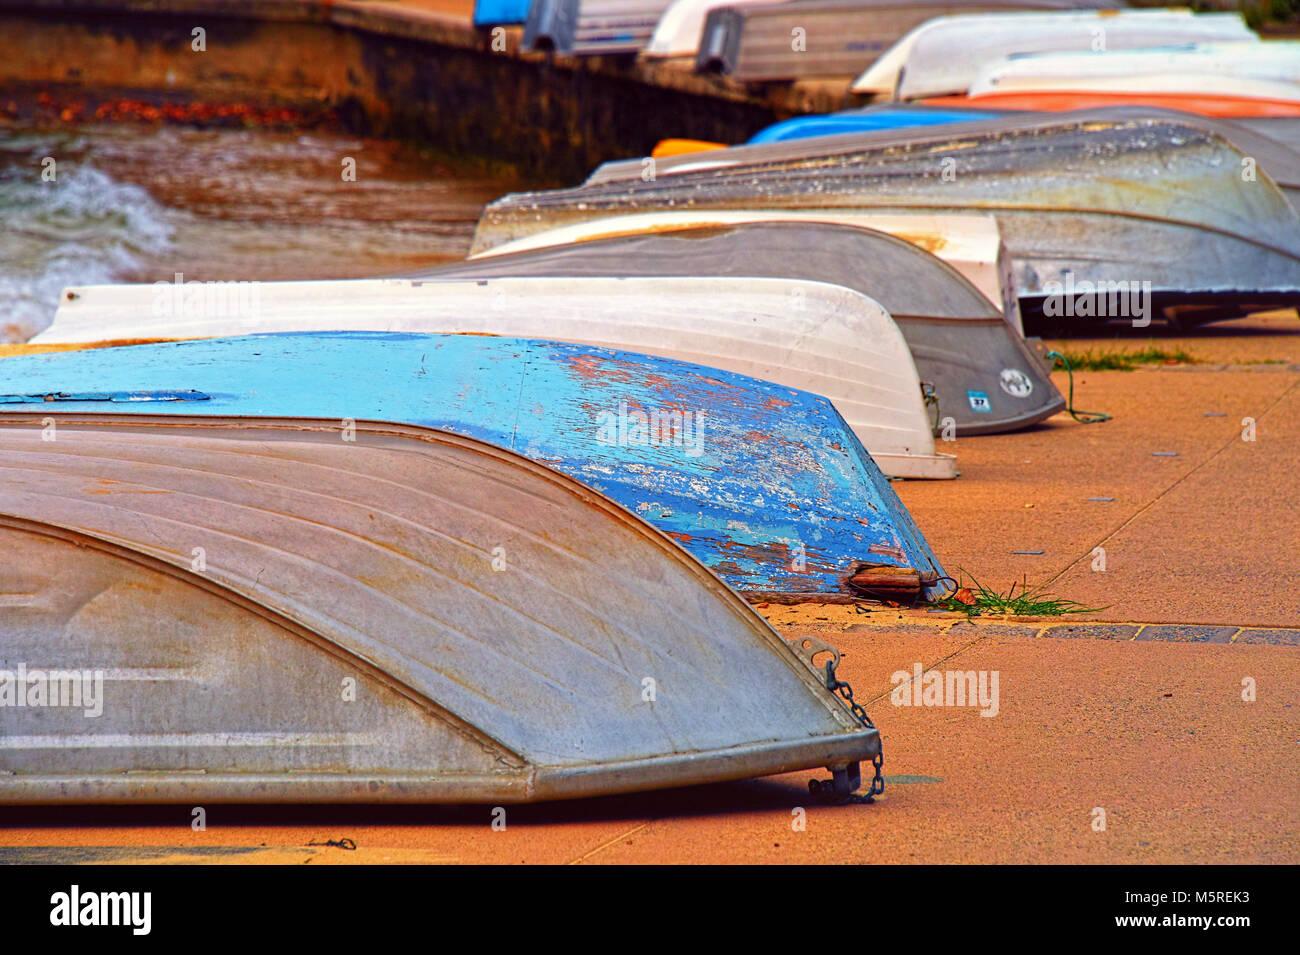 Boats, Sydney, Australia - Stock Image